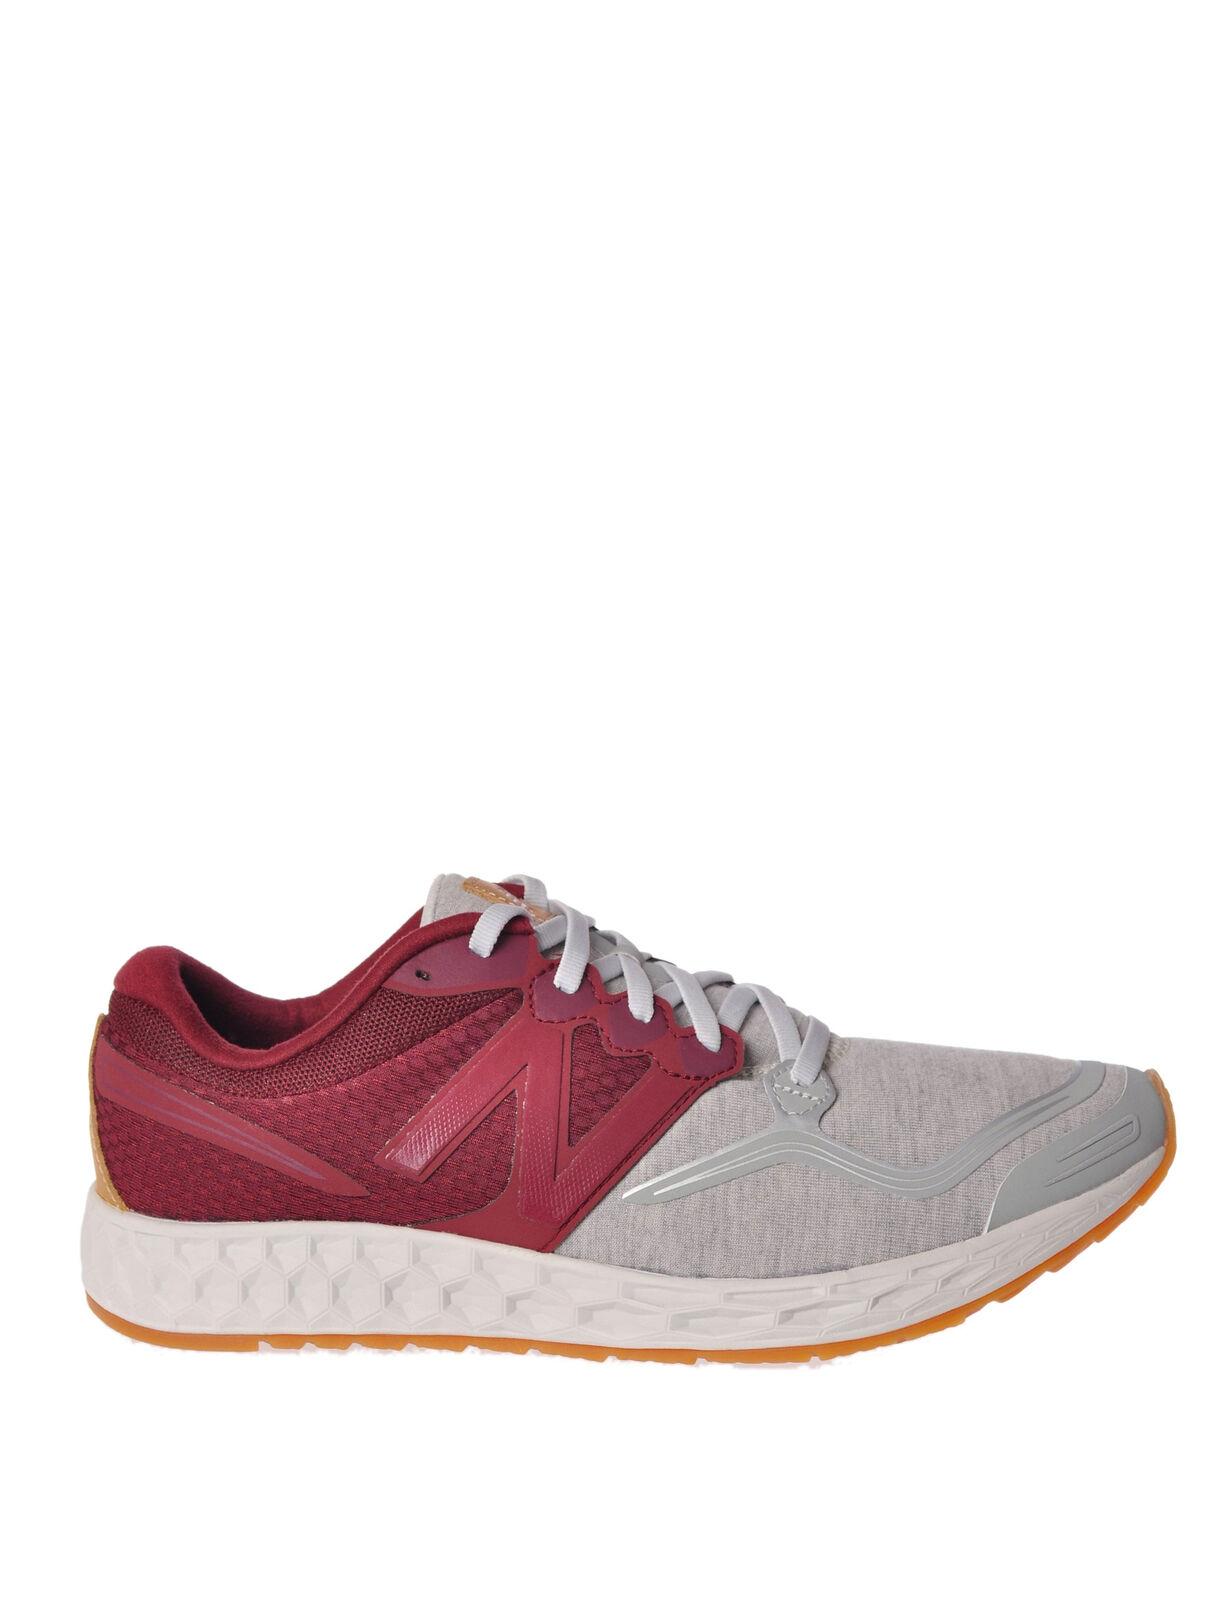 New Balance - - - zapatos-zapatilla de deporte-niedrige - Frau - rojo - 453515C184500  moda clasica